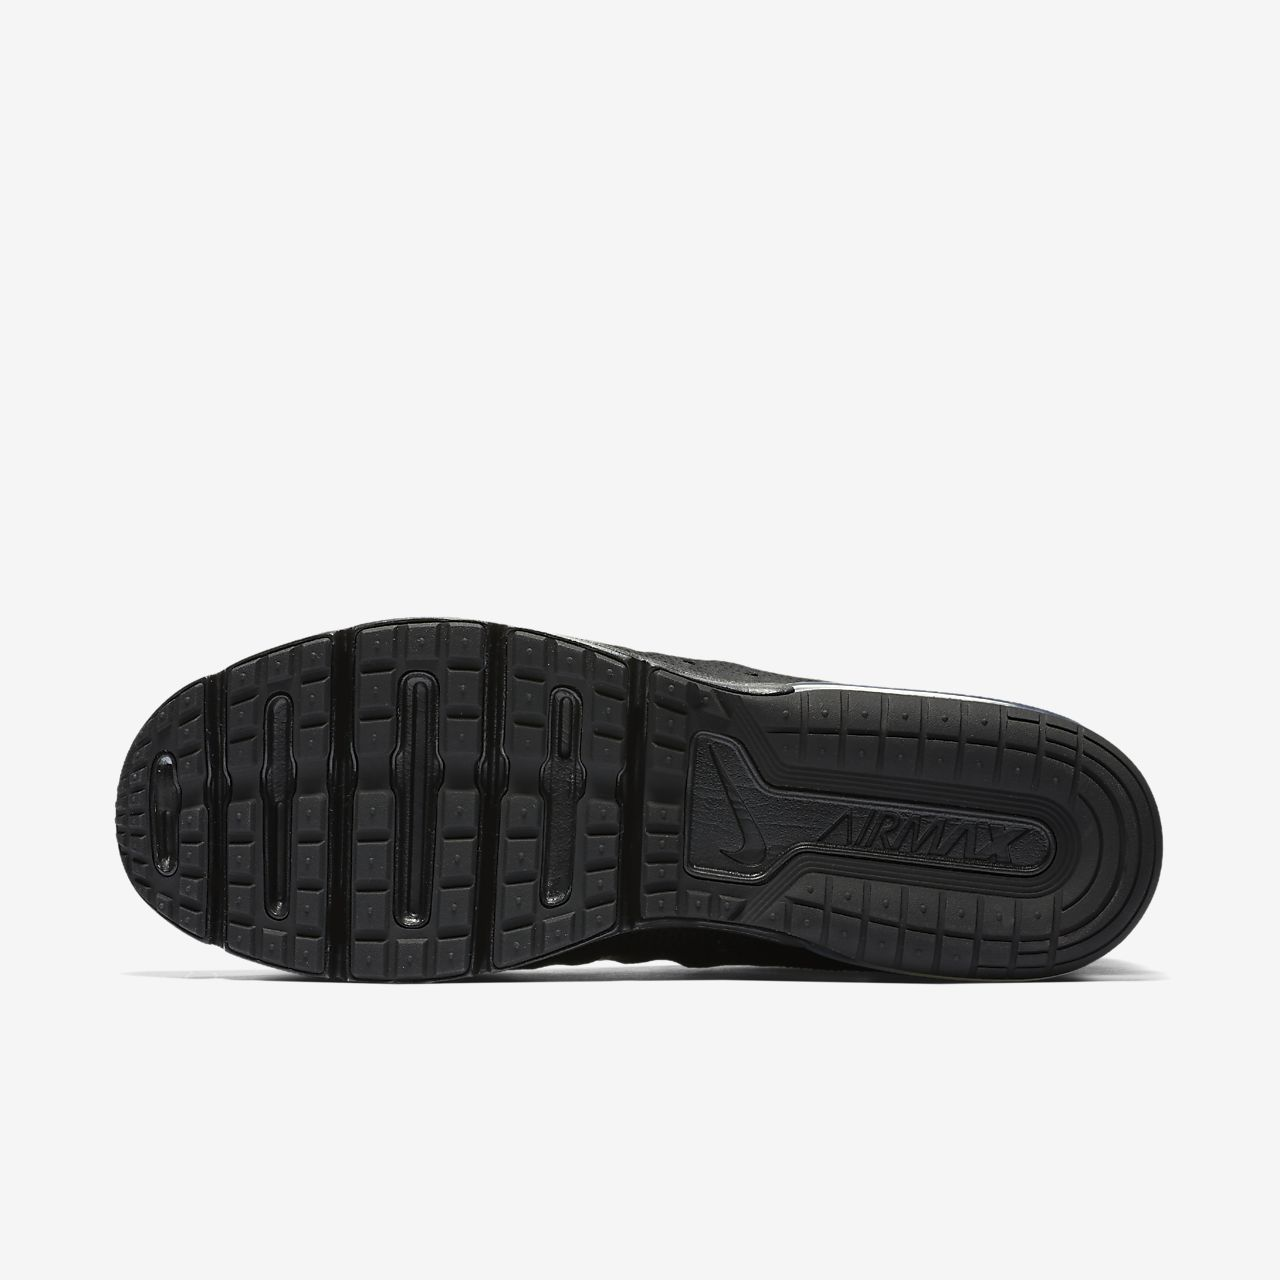 b229eb2306f Nike Air Max Sequent 3 Men s Running Shoe. Nike.com IL